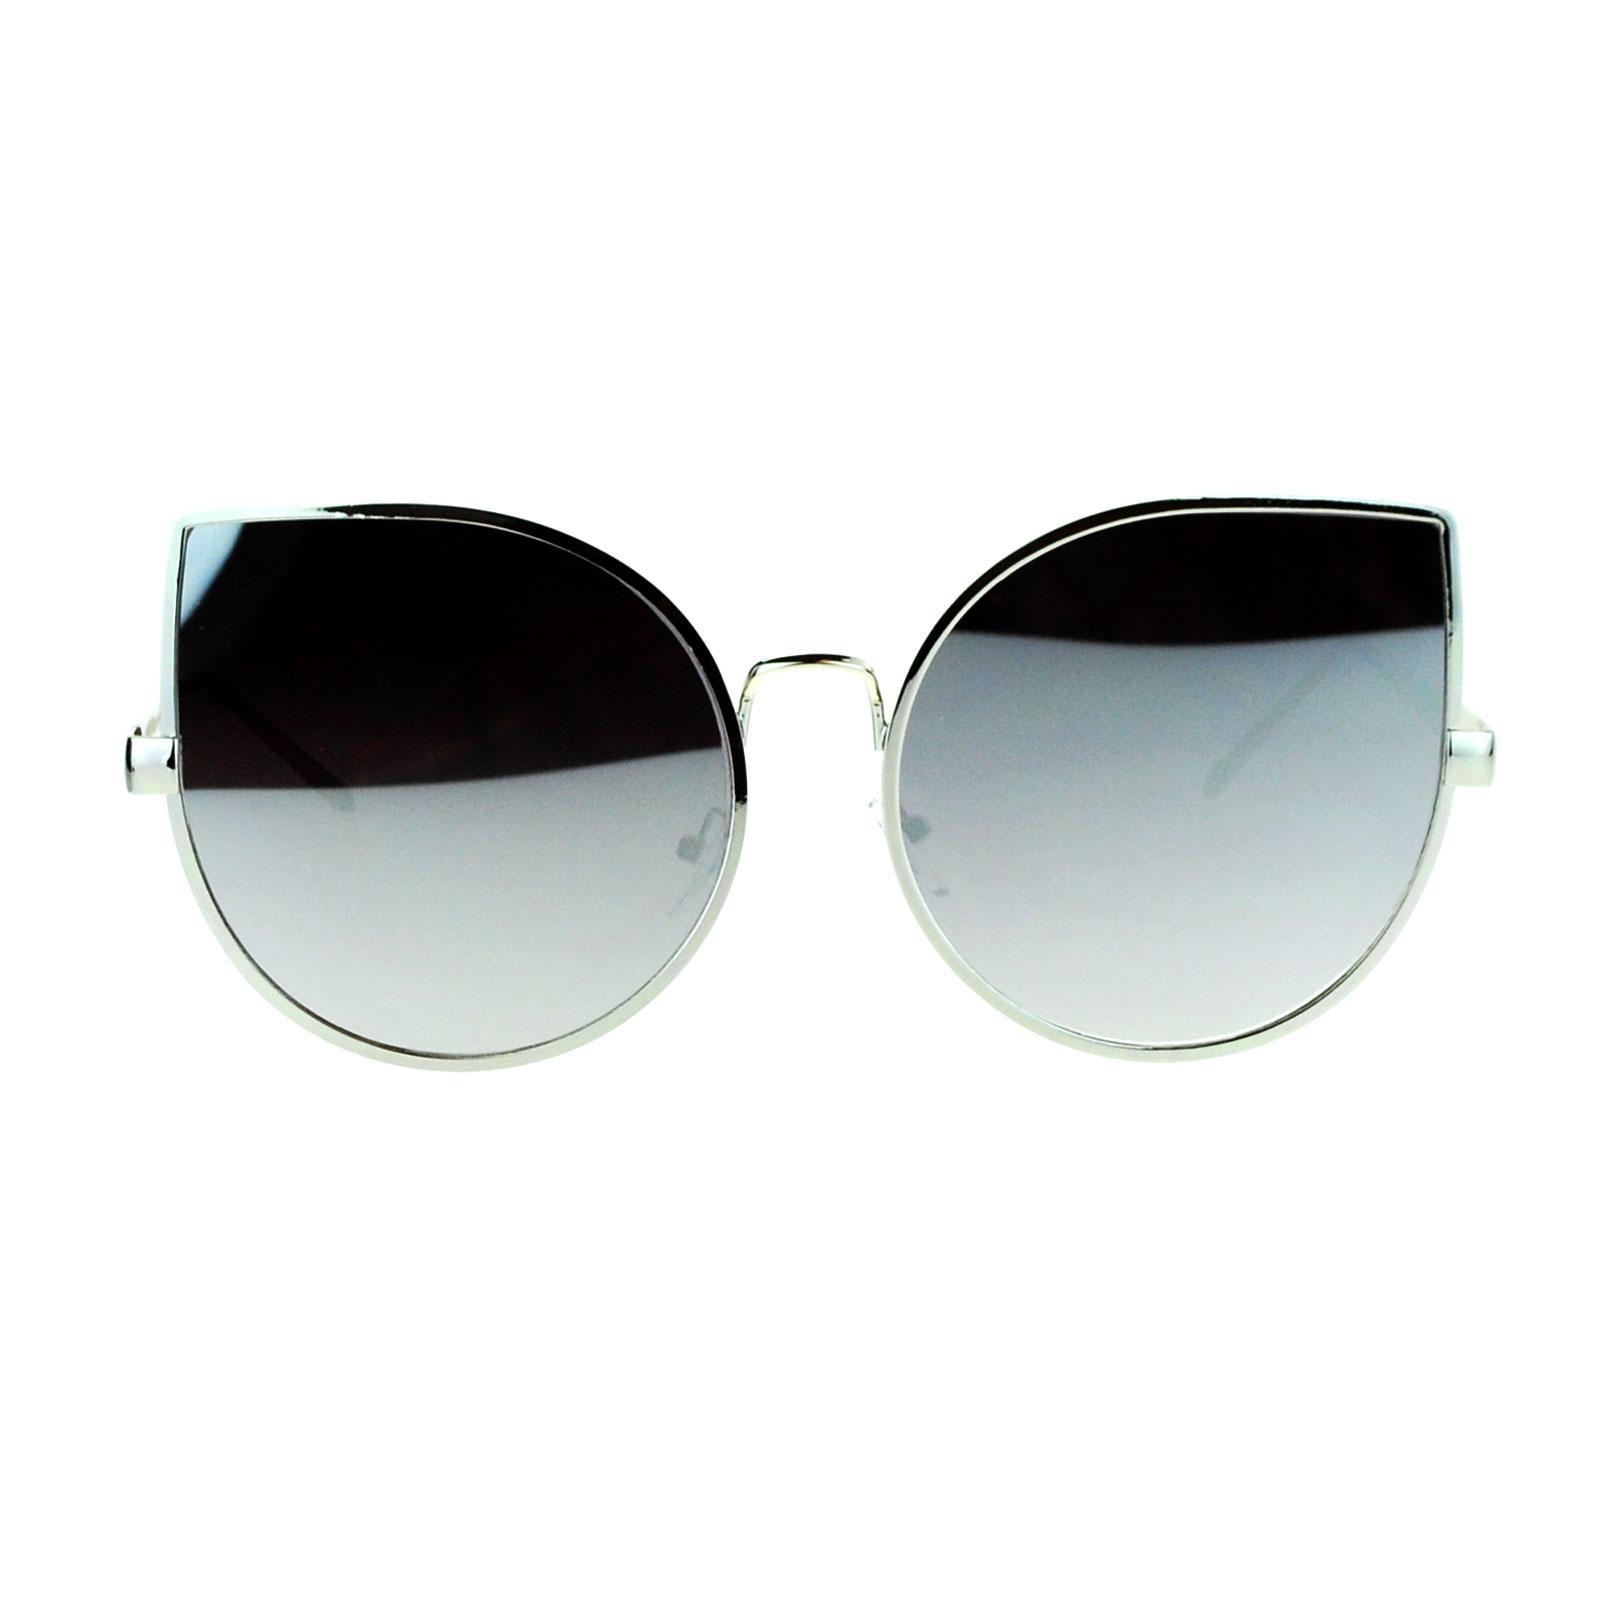 Circle Sunglasses  sa106 retro flat lens bat shape metal rim cat eye circle